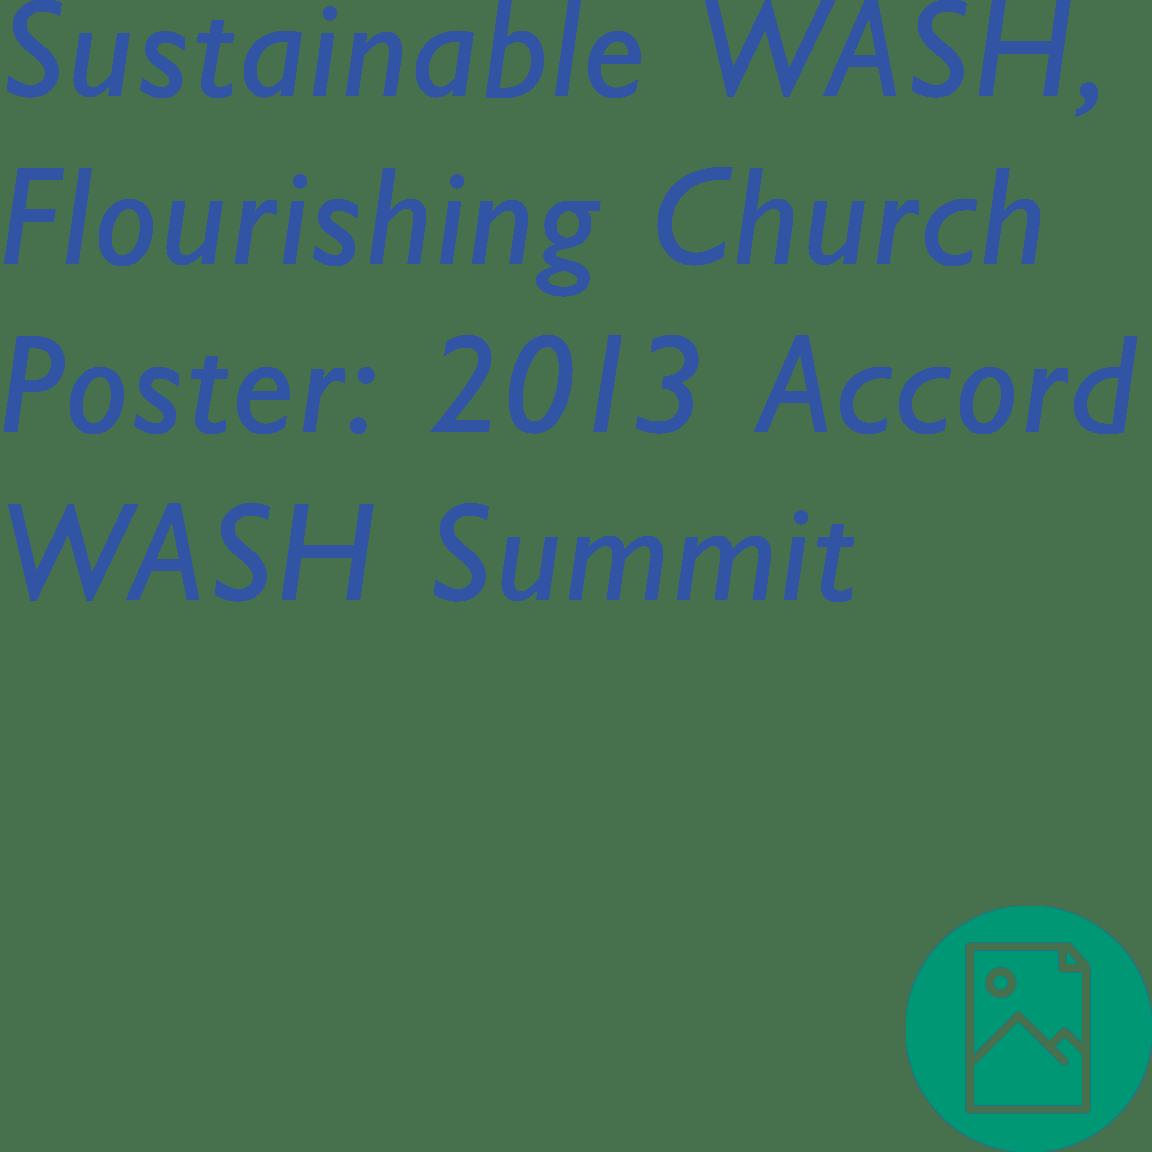 Sustainable WASH, Flourishing Church